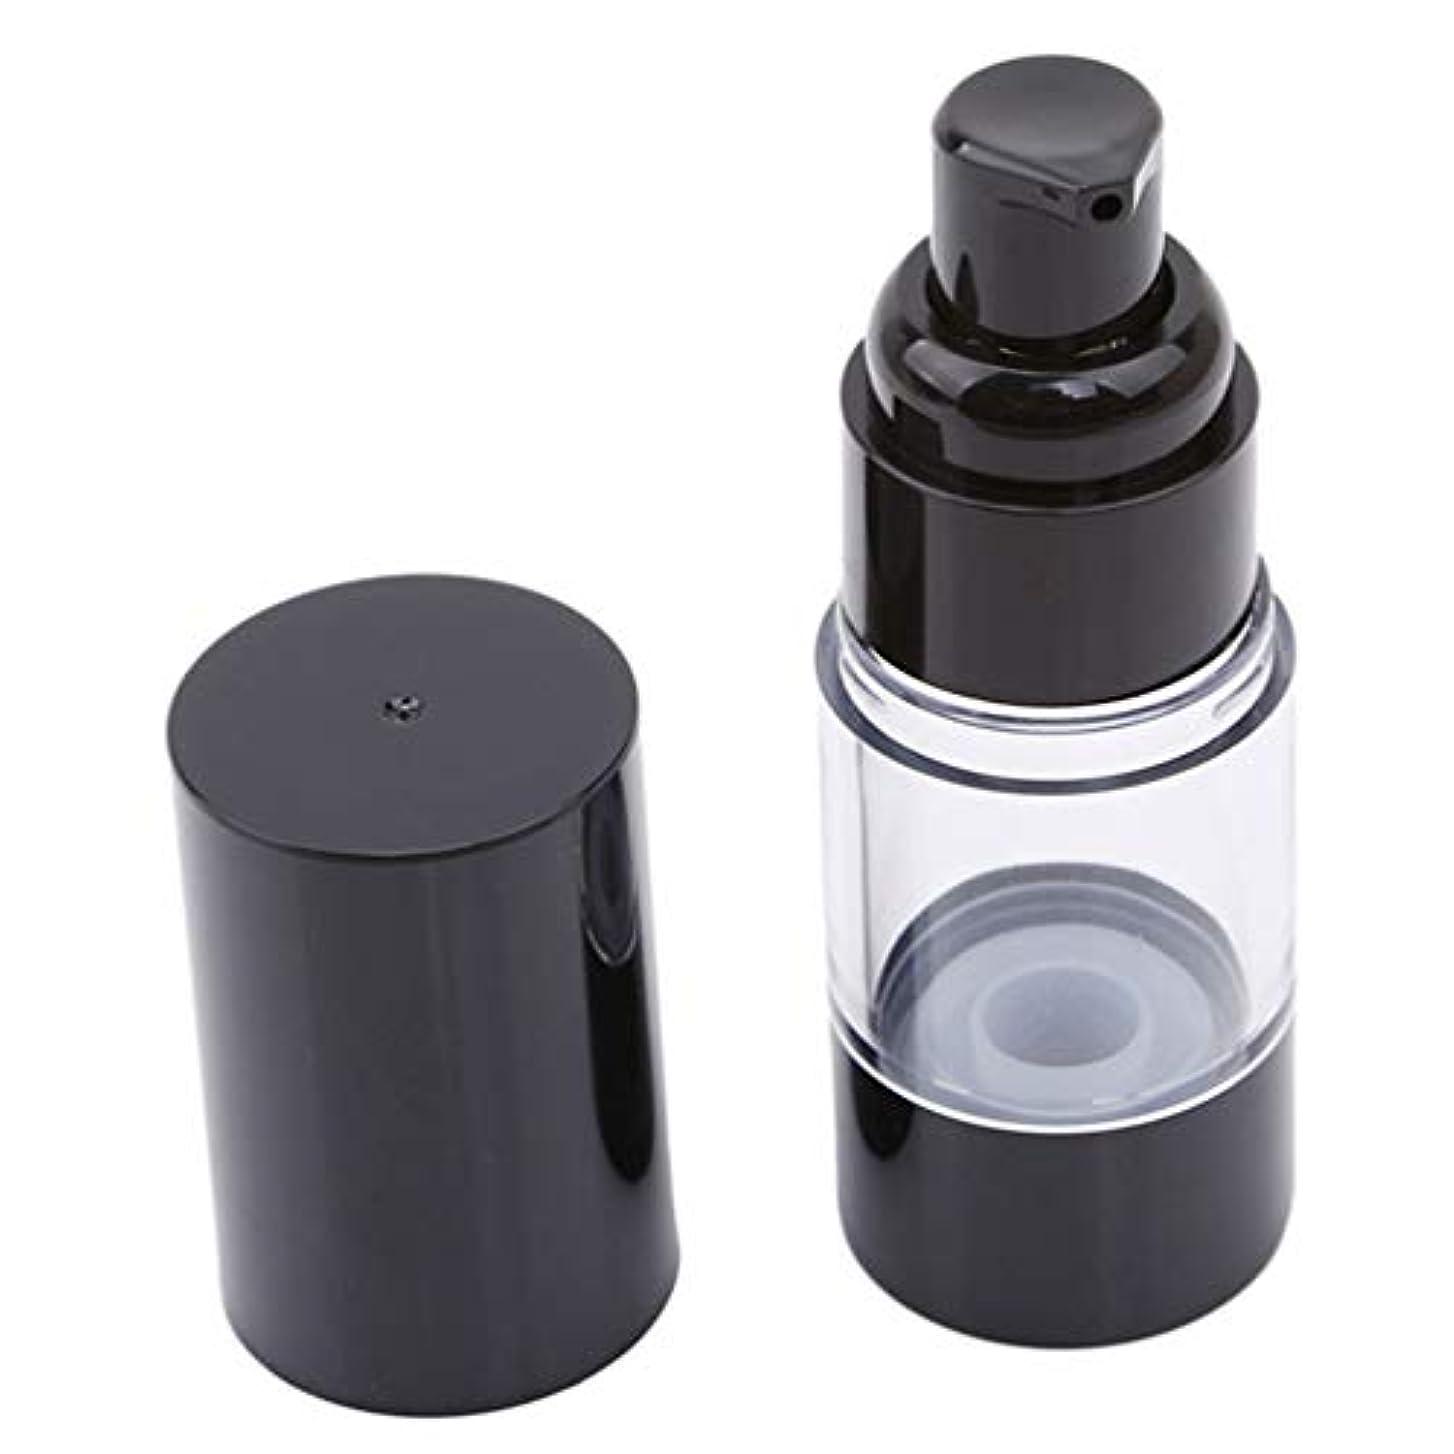 LJSLYJ 真空ポンプ化粧品ボトル旅行ポータブルBBクリームファンデーションプレスミニエマルジョンスプレー空のボトル、15ミリリットル